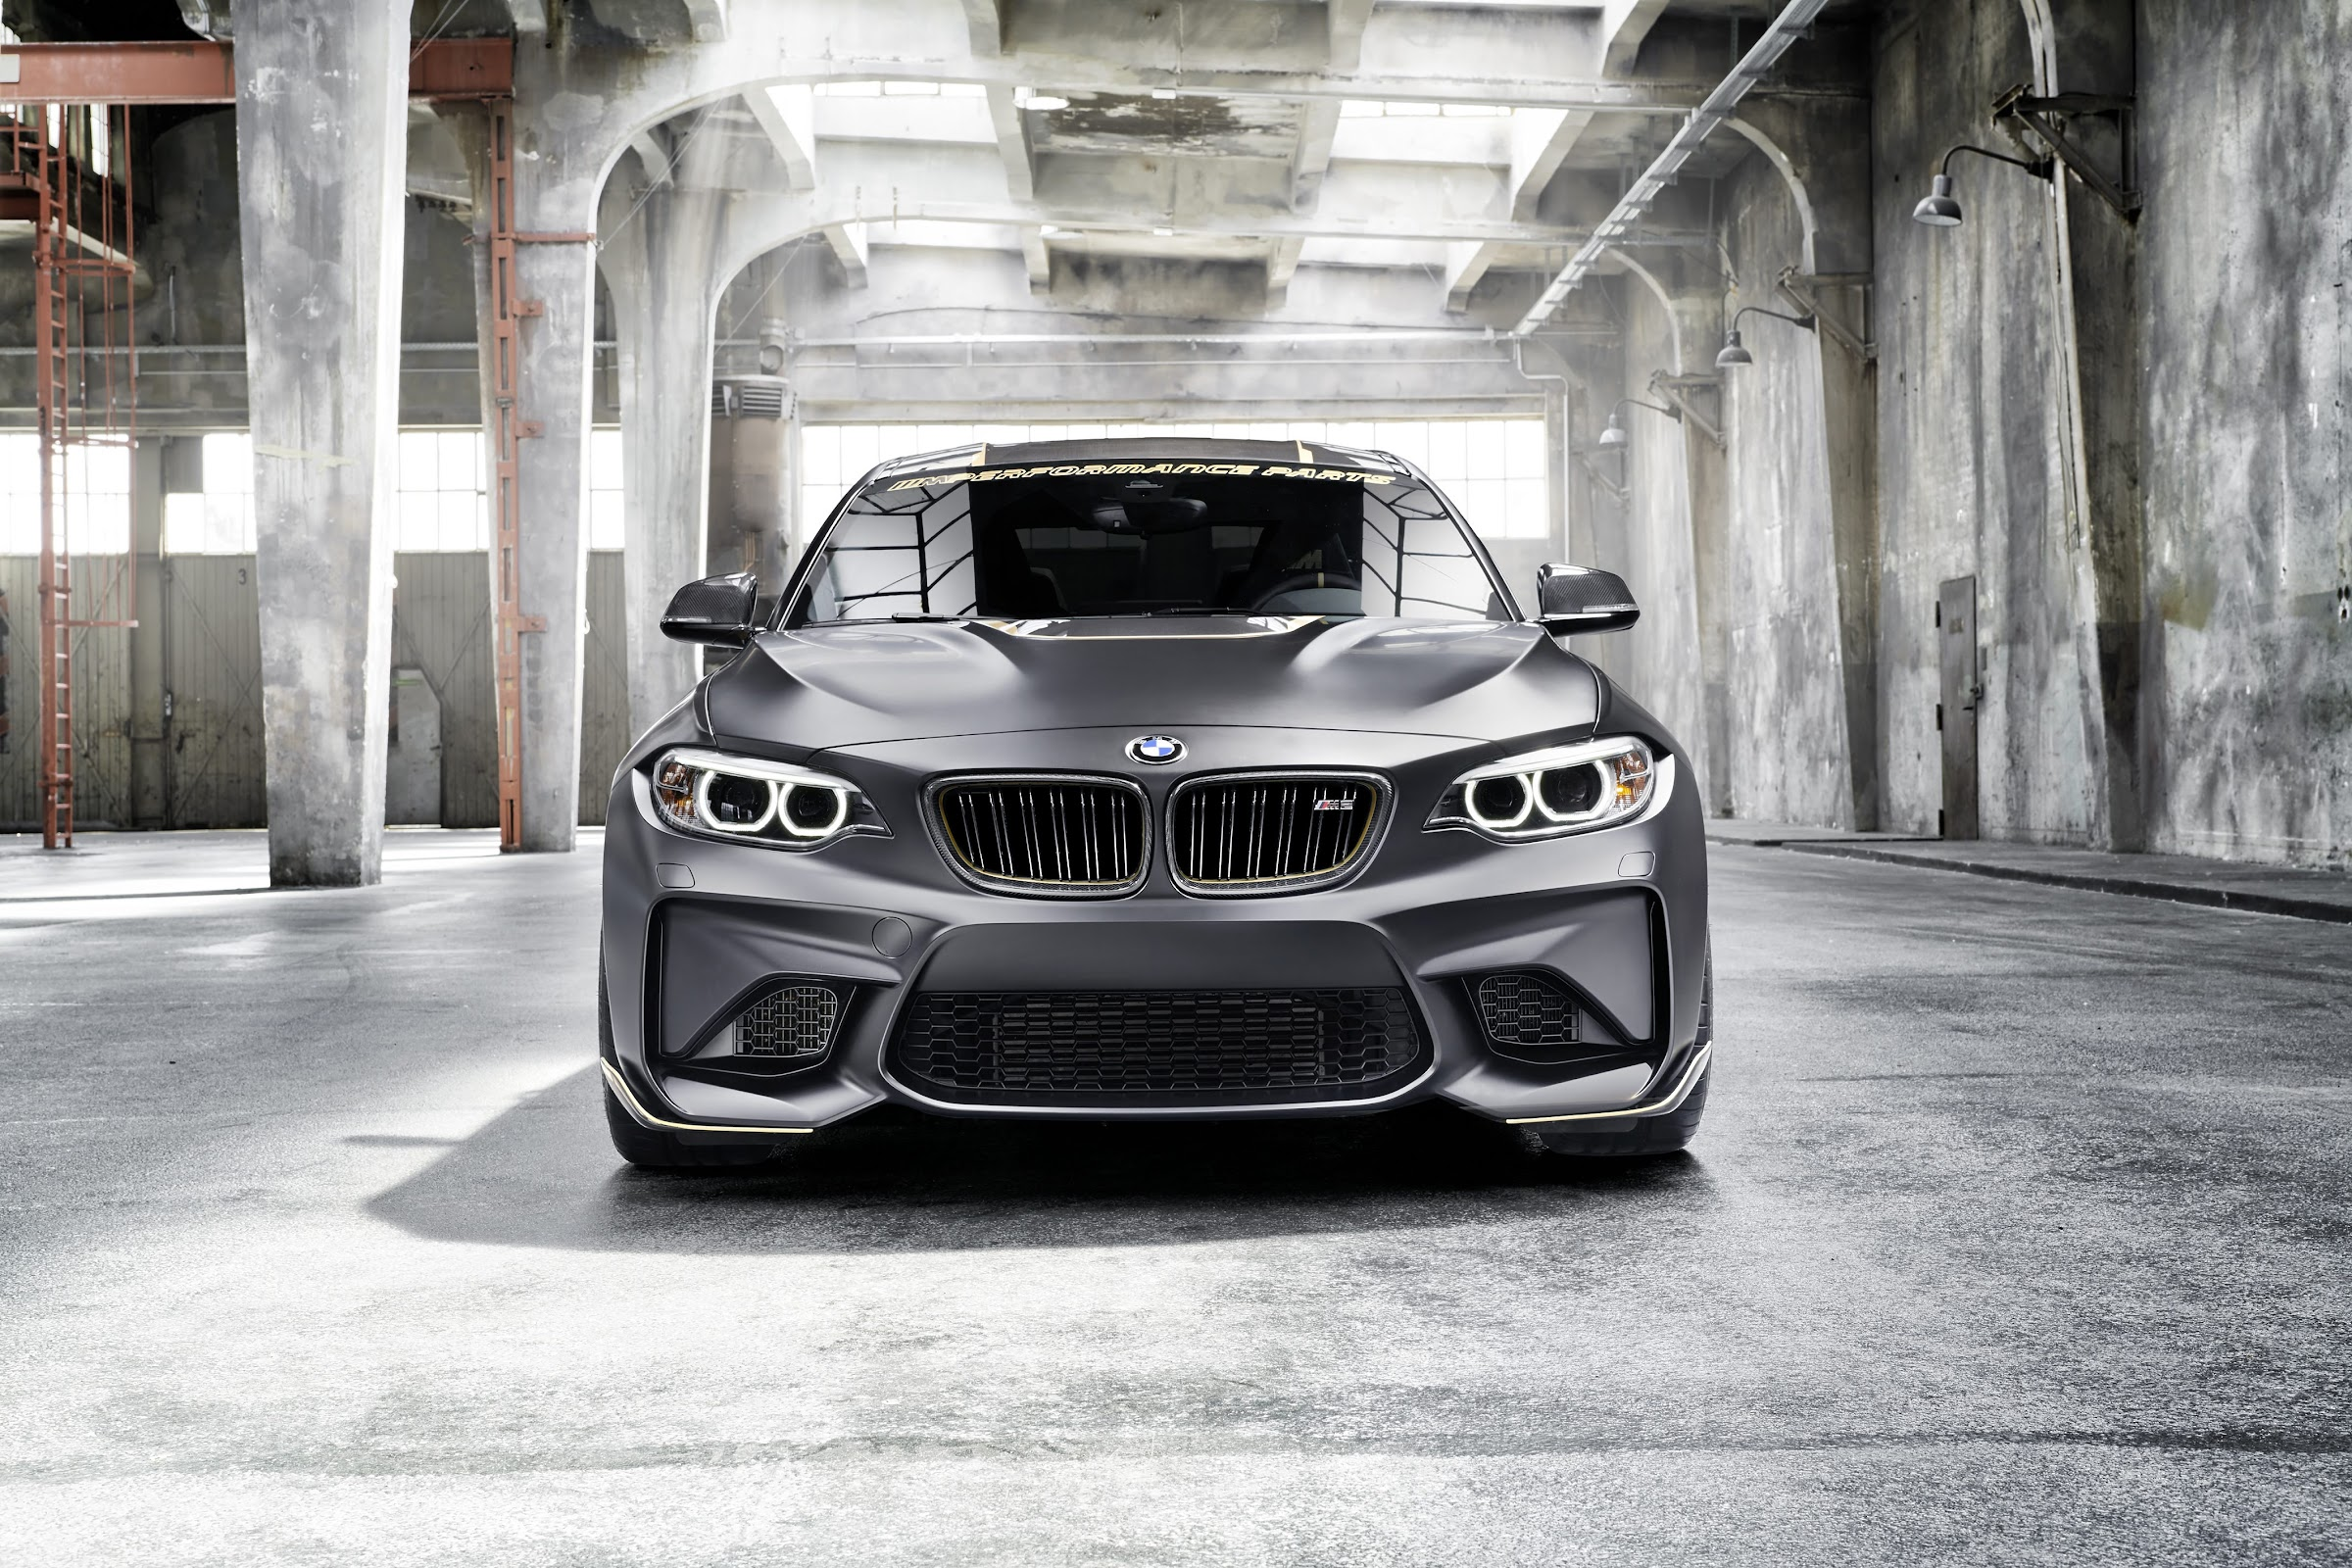 tH5xD EFVgbWs9568dFmN7LaeGstOWN537R0yGsuuzNF w1jdqhAqKq7Q2oC9ZYLu2V2KdDR m 3EIQfYopcRJNFiyEL847sc6XgfyEeGCrVQMrwivJpJAtxUPNTk FfxoPflmljEQ=w2400 - Nuevo BMW M Performance Parts Concept